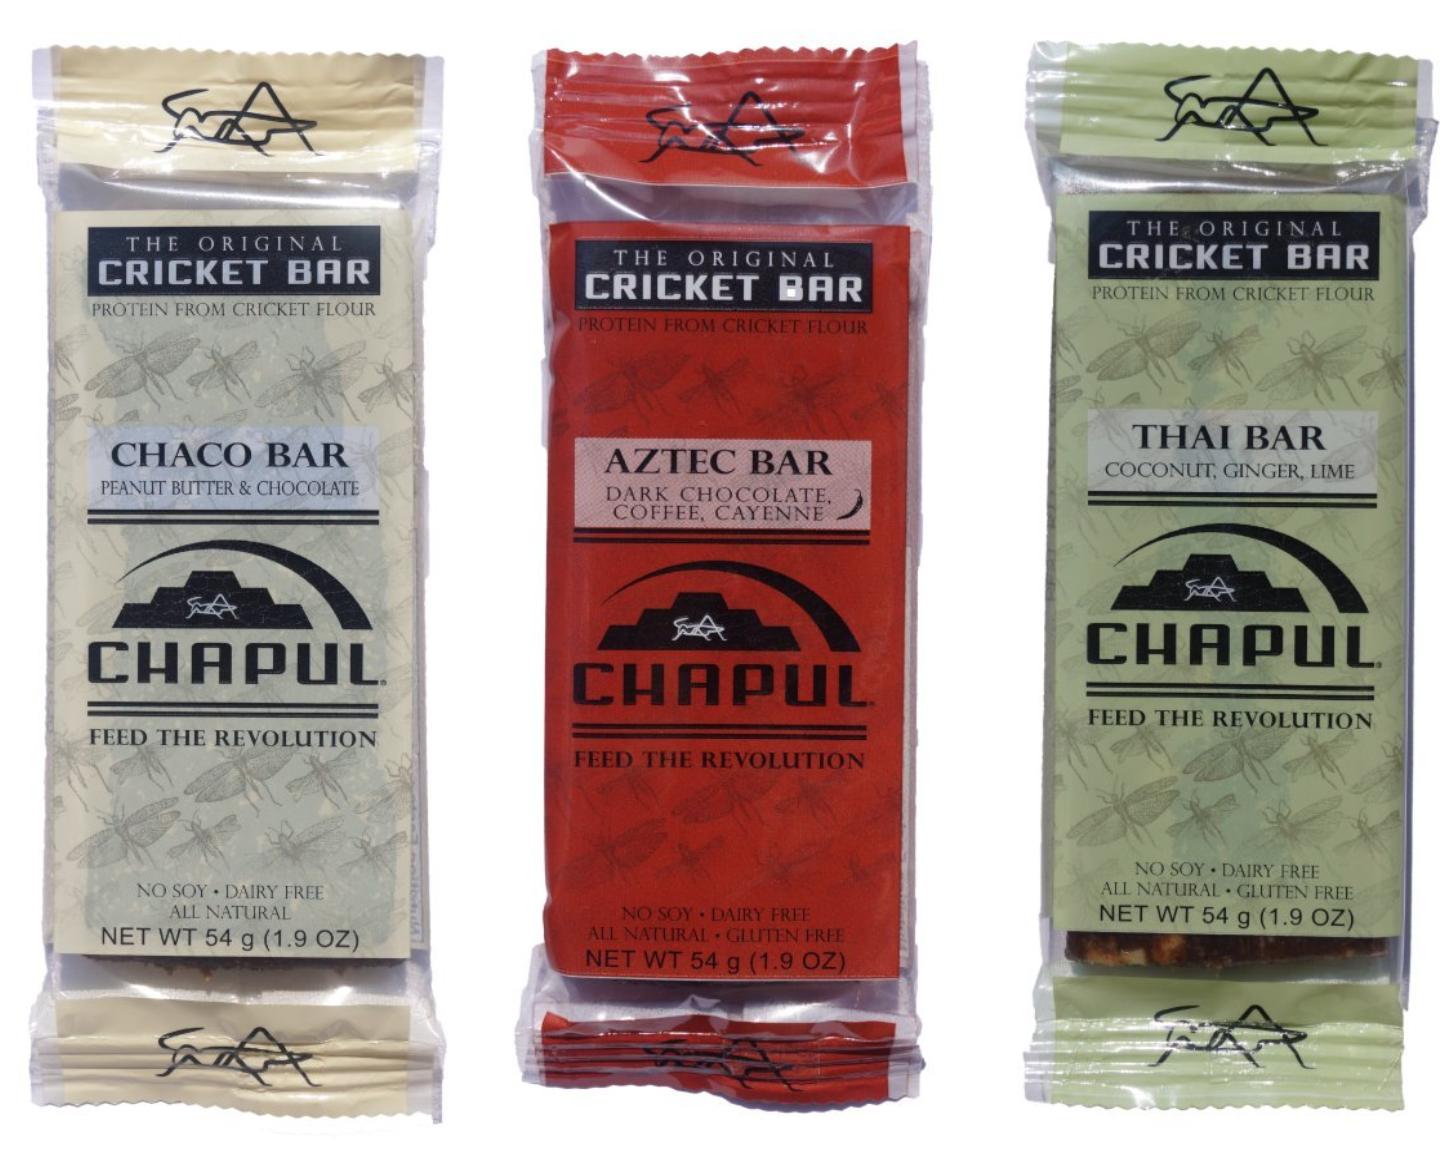 chapul-cricket-bars.jpg